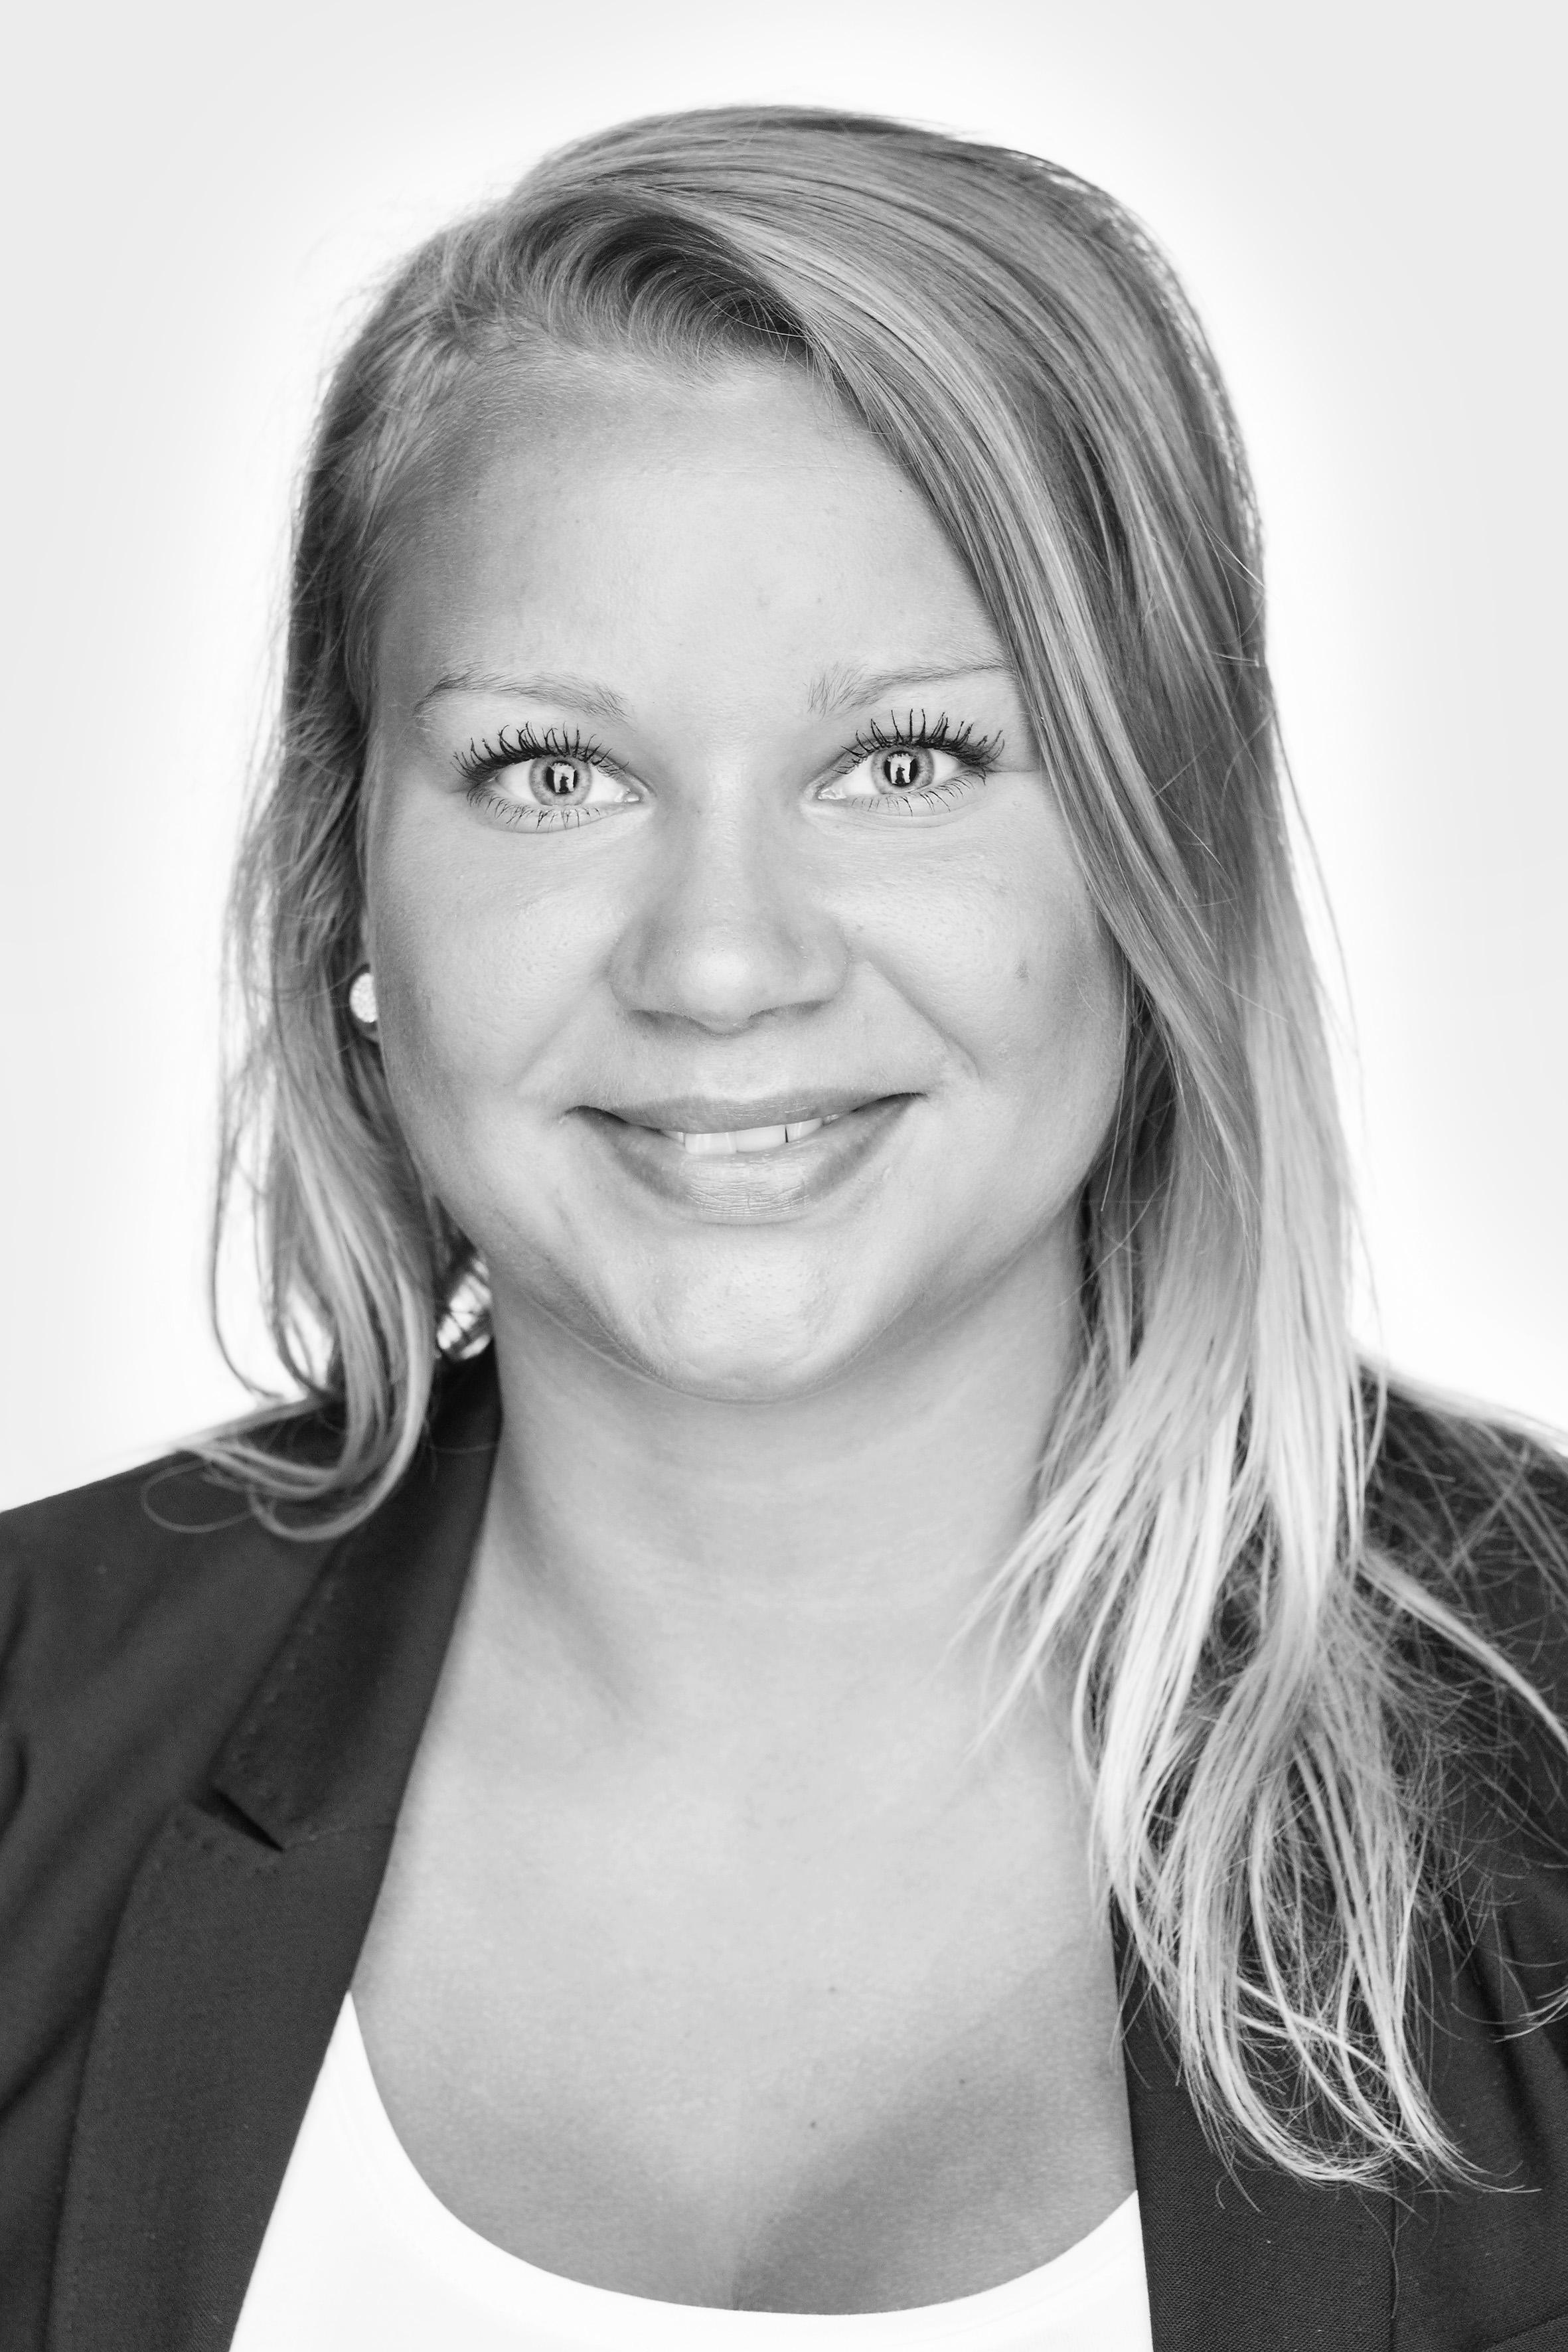 Josephine Nyqvist